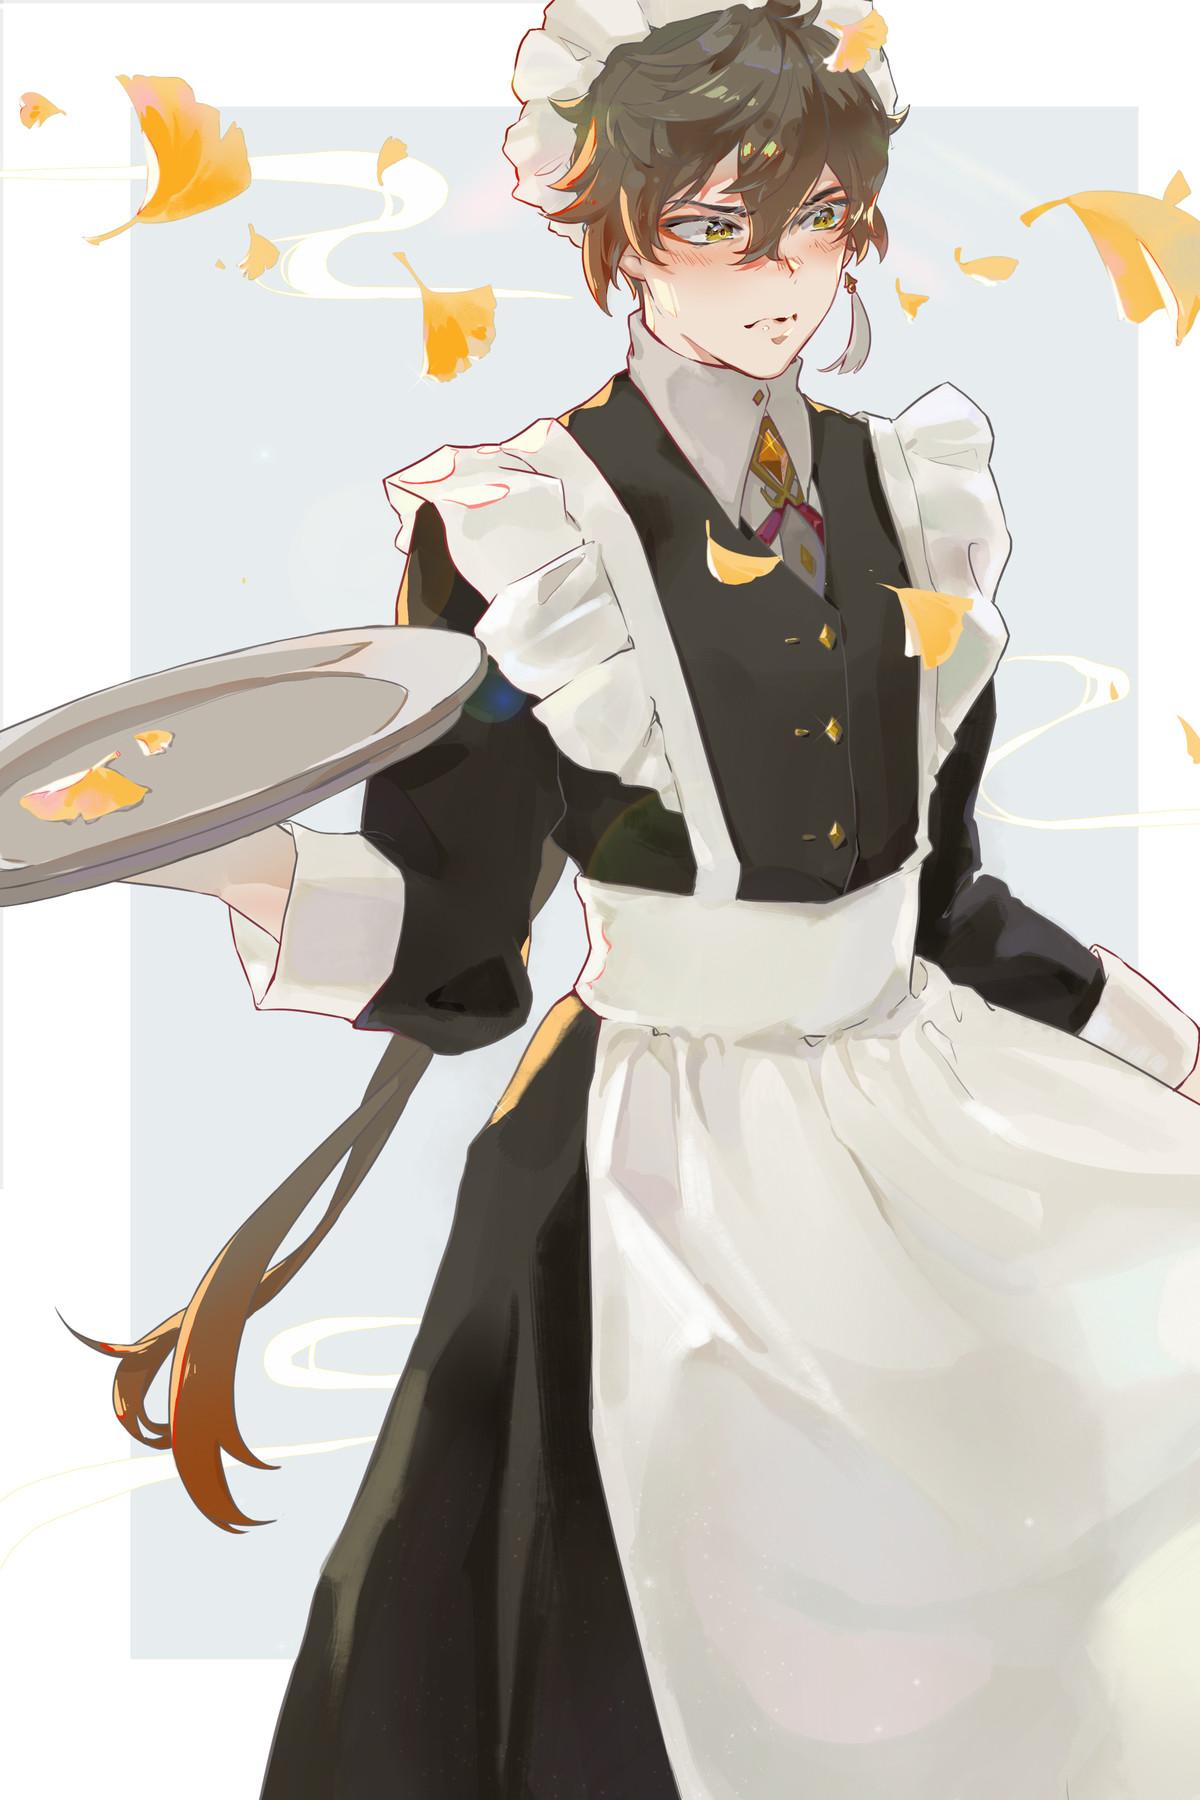 genshin maids. join list: SplendidServants (495 subs)Mention History join list: